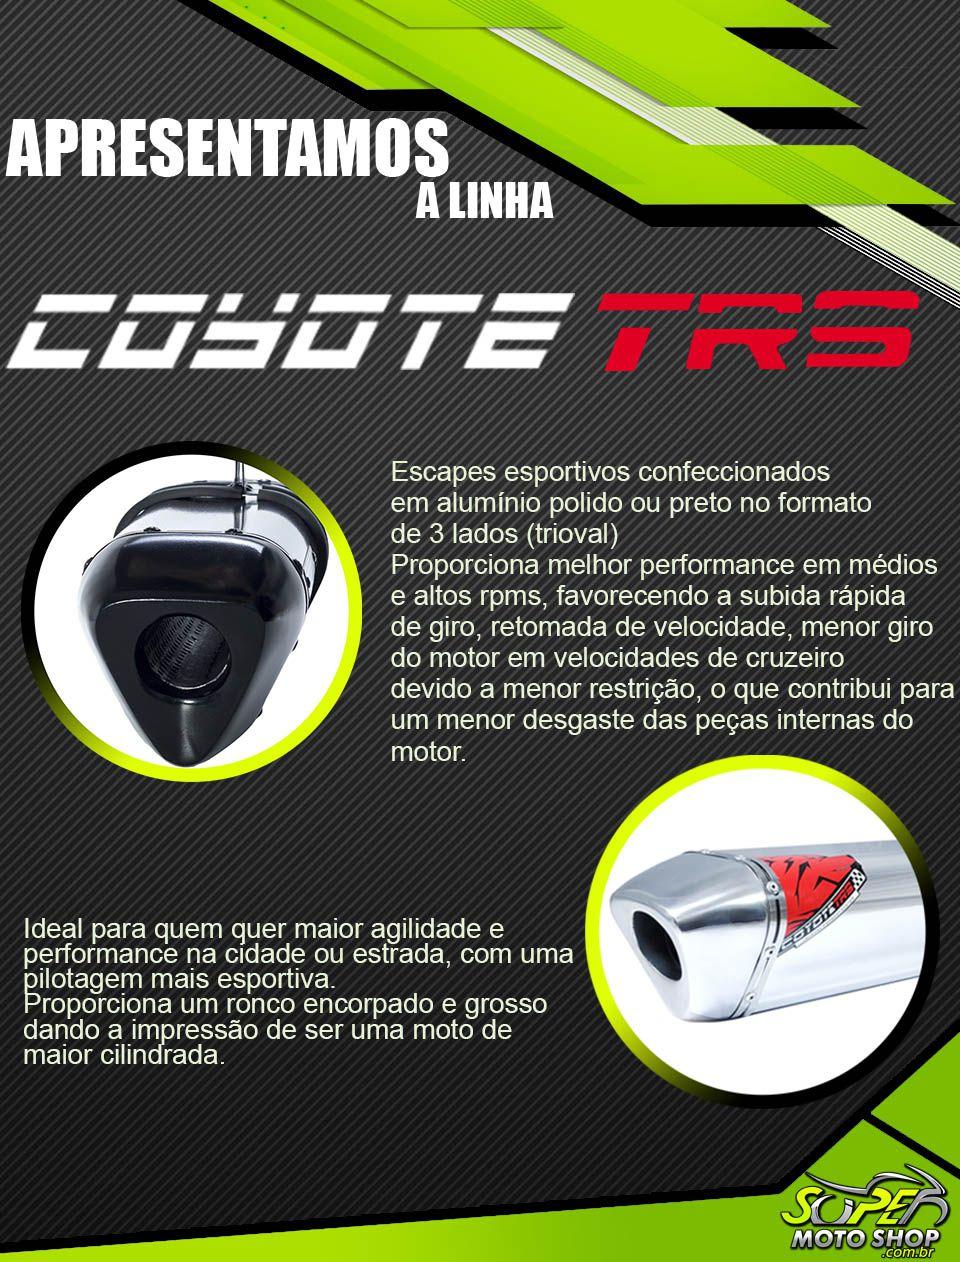 Escape / Ponteira Coyote TRS Tri-Oval 300mm Alumínio - Bandit 650 N/S até 2008 - Suzuki